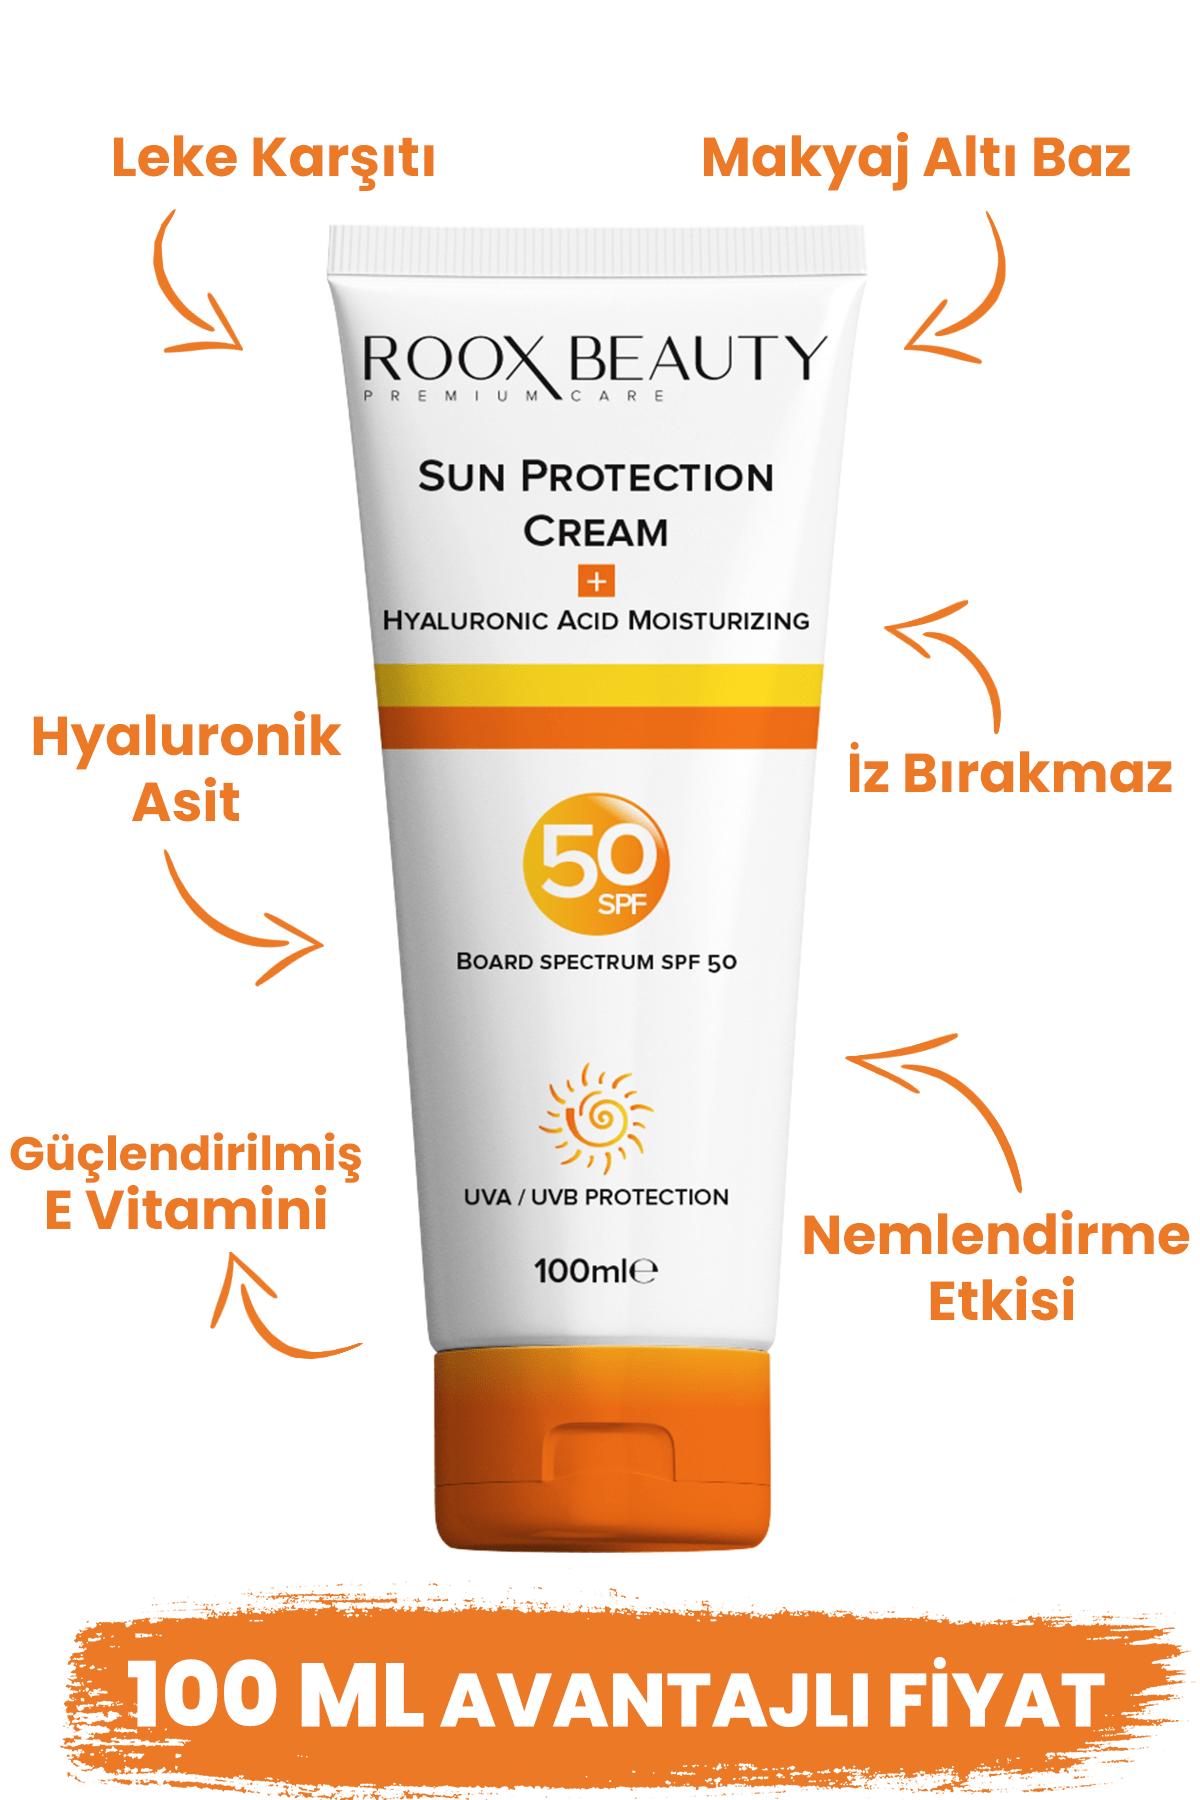 Roox Beauty Güneş Kremi Spf 50 - Yüksek Koruma - Leke Karşıtı - Aile Boyu 100 ml 0